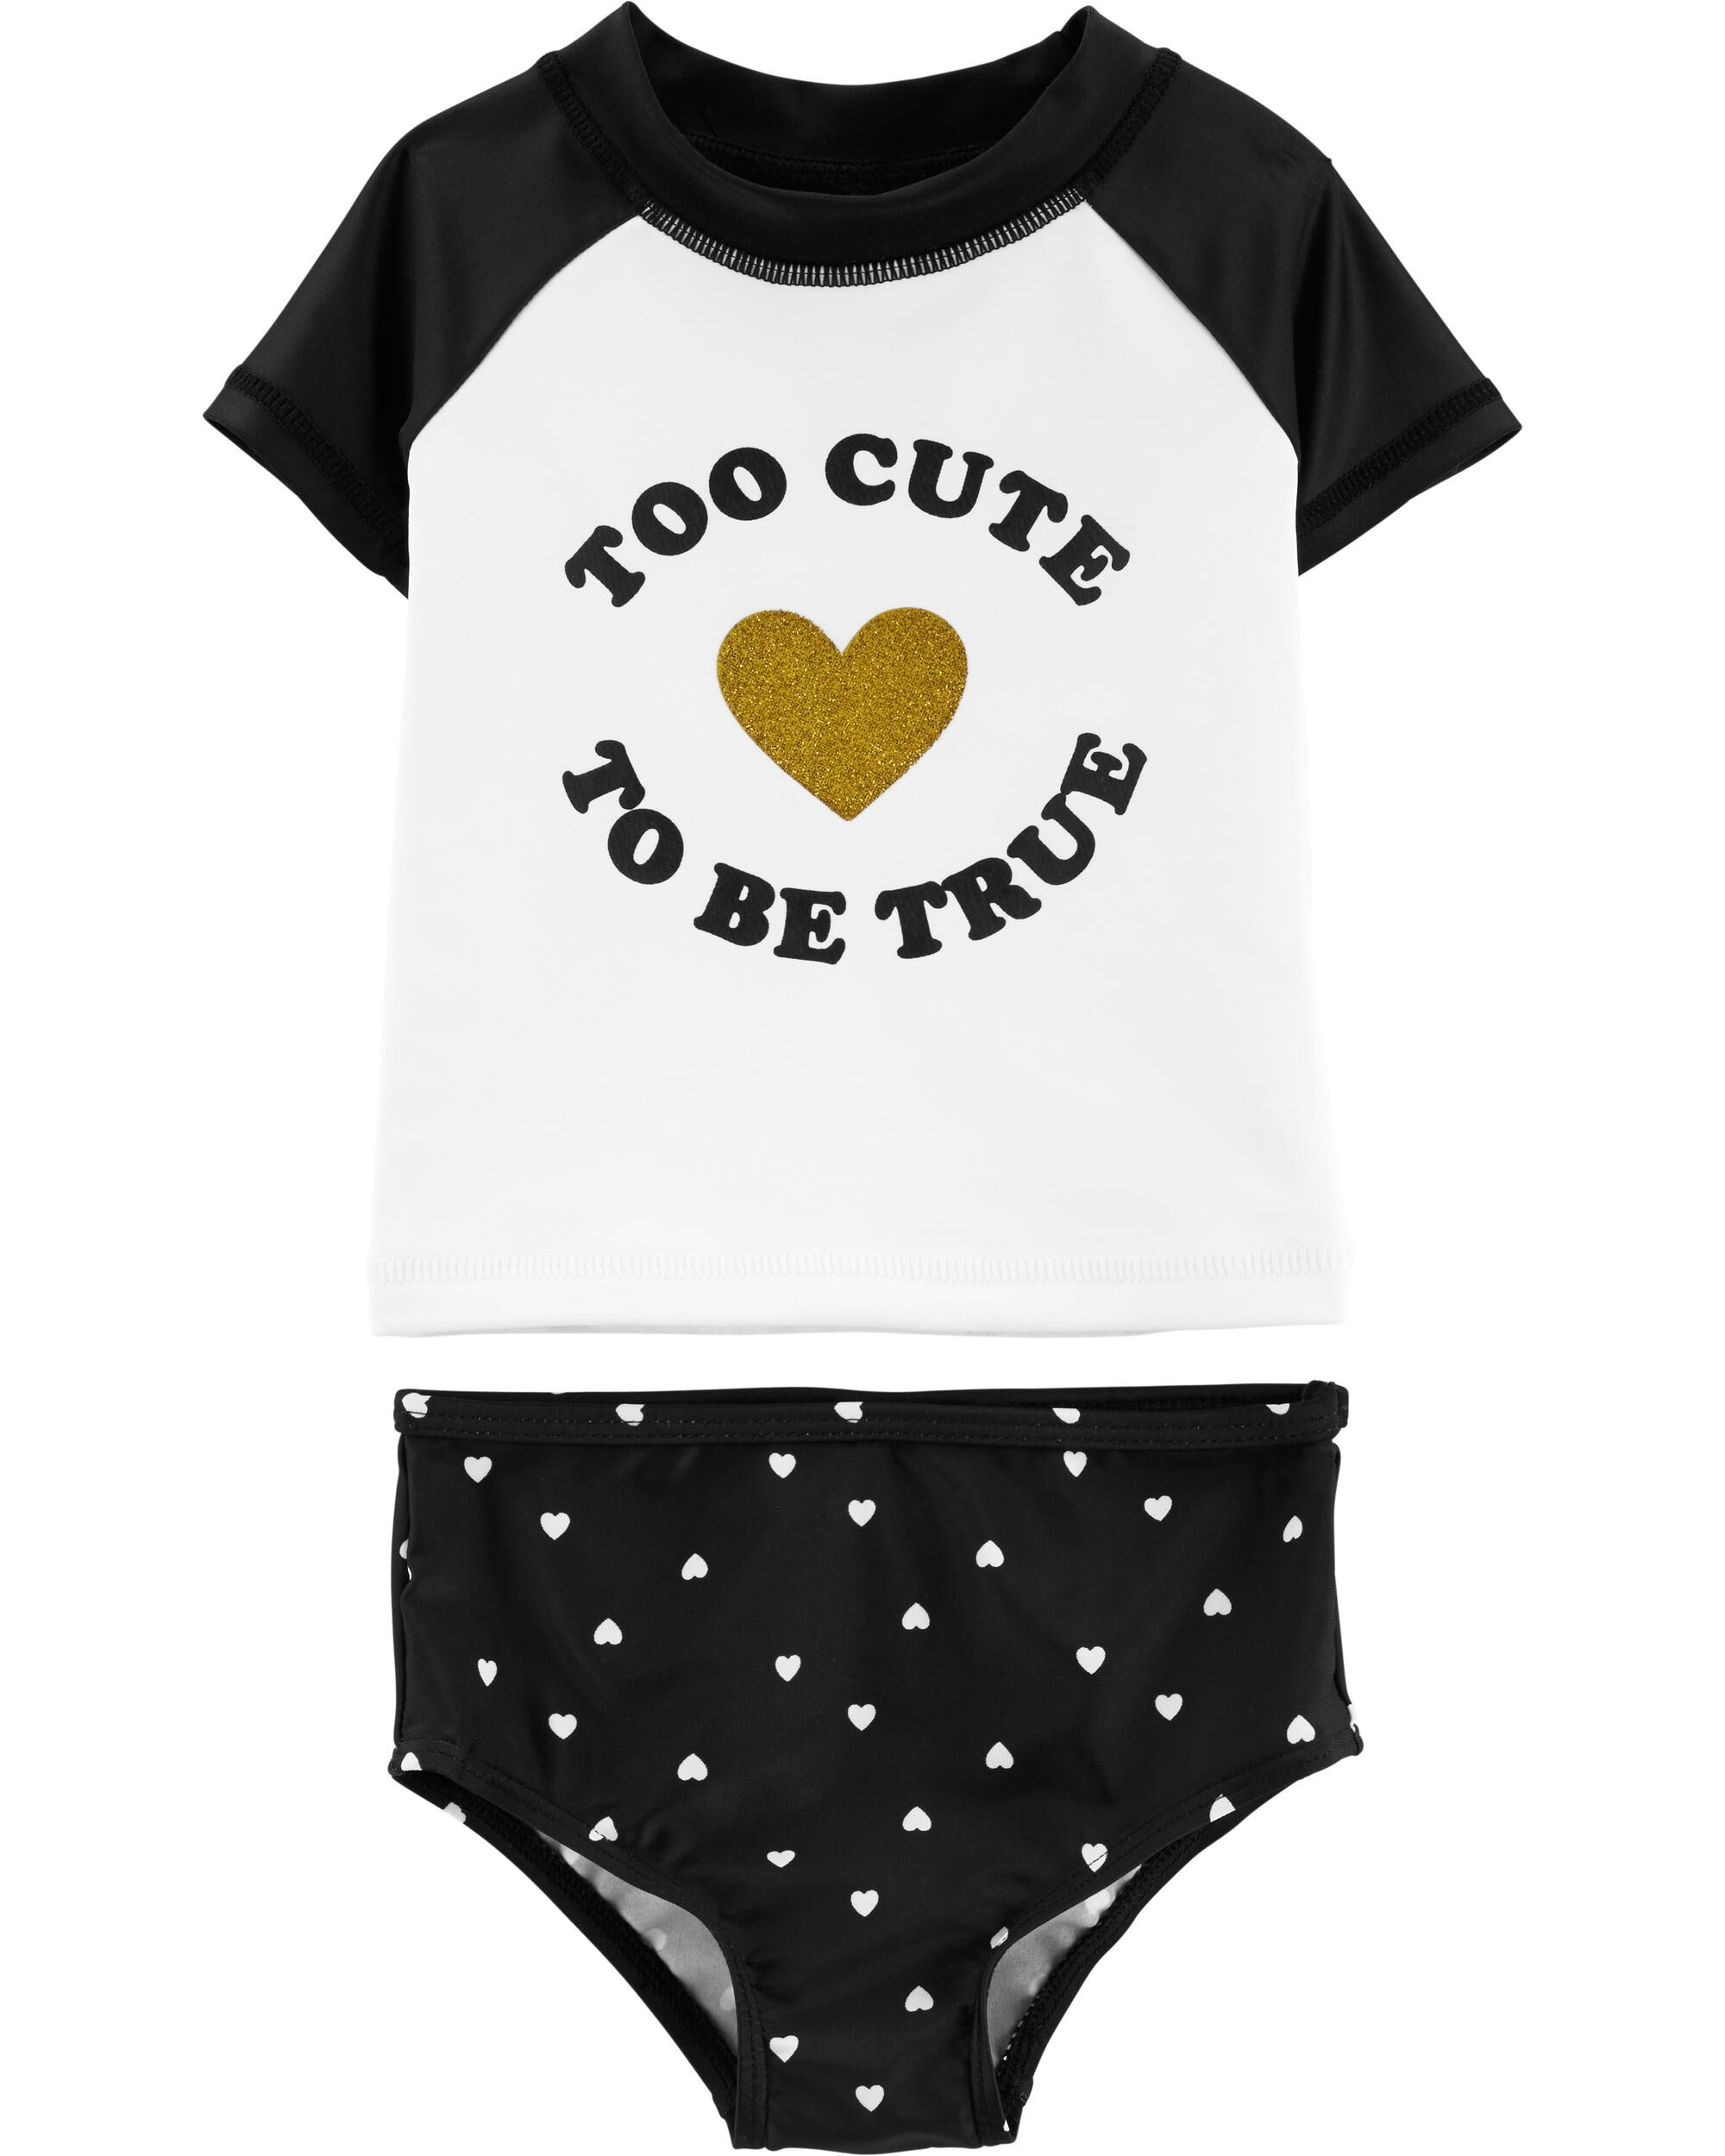 Batman Maniacal Spiral Unisex Toddler T Shirt for Boys and Girls